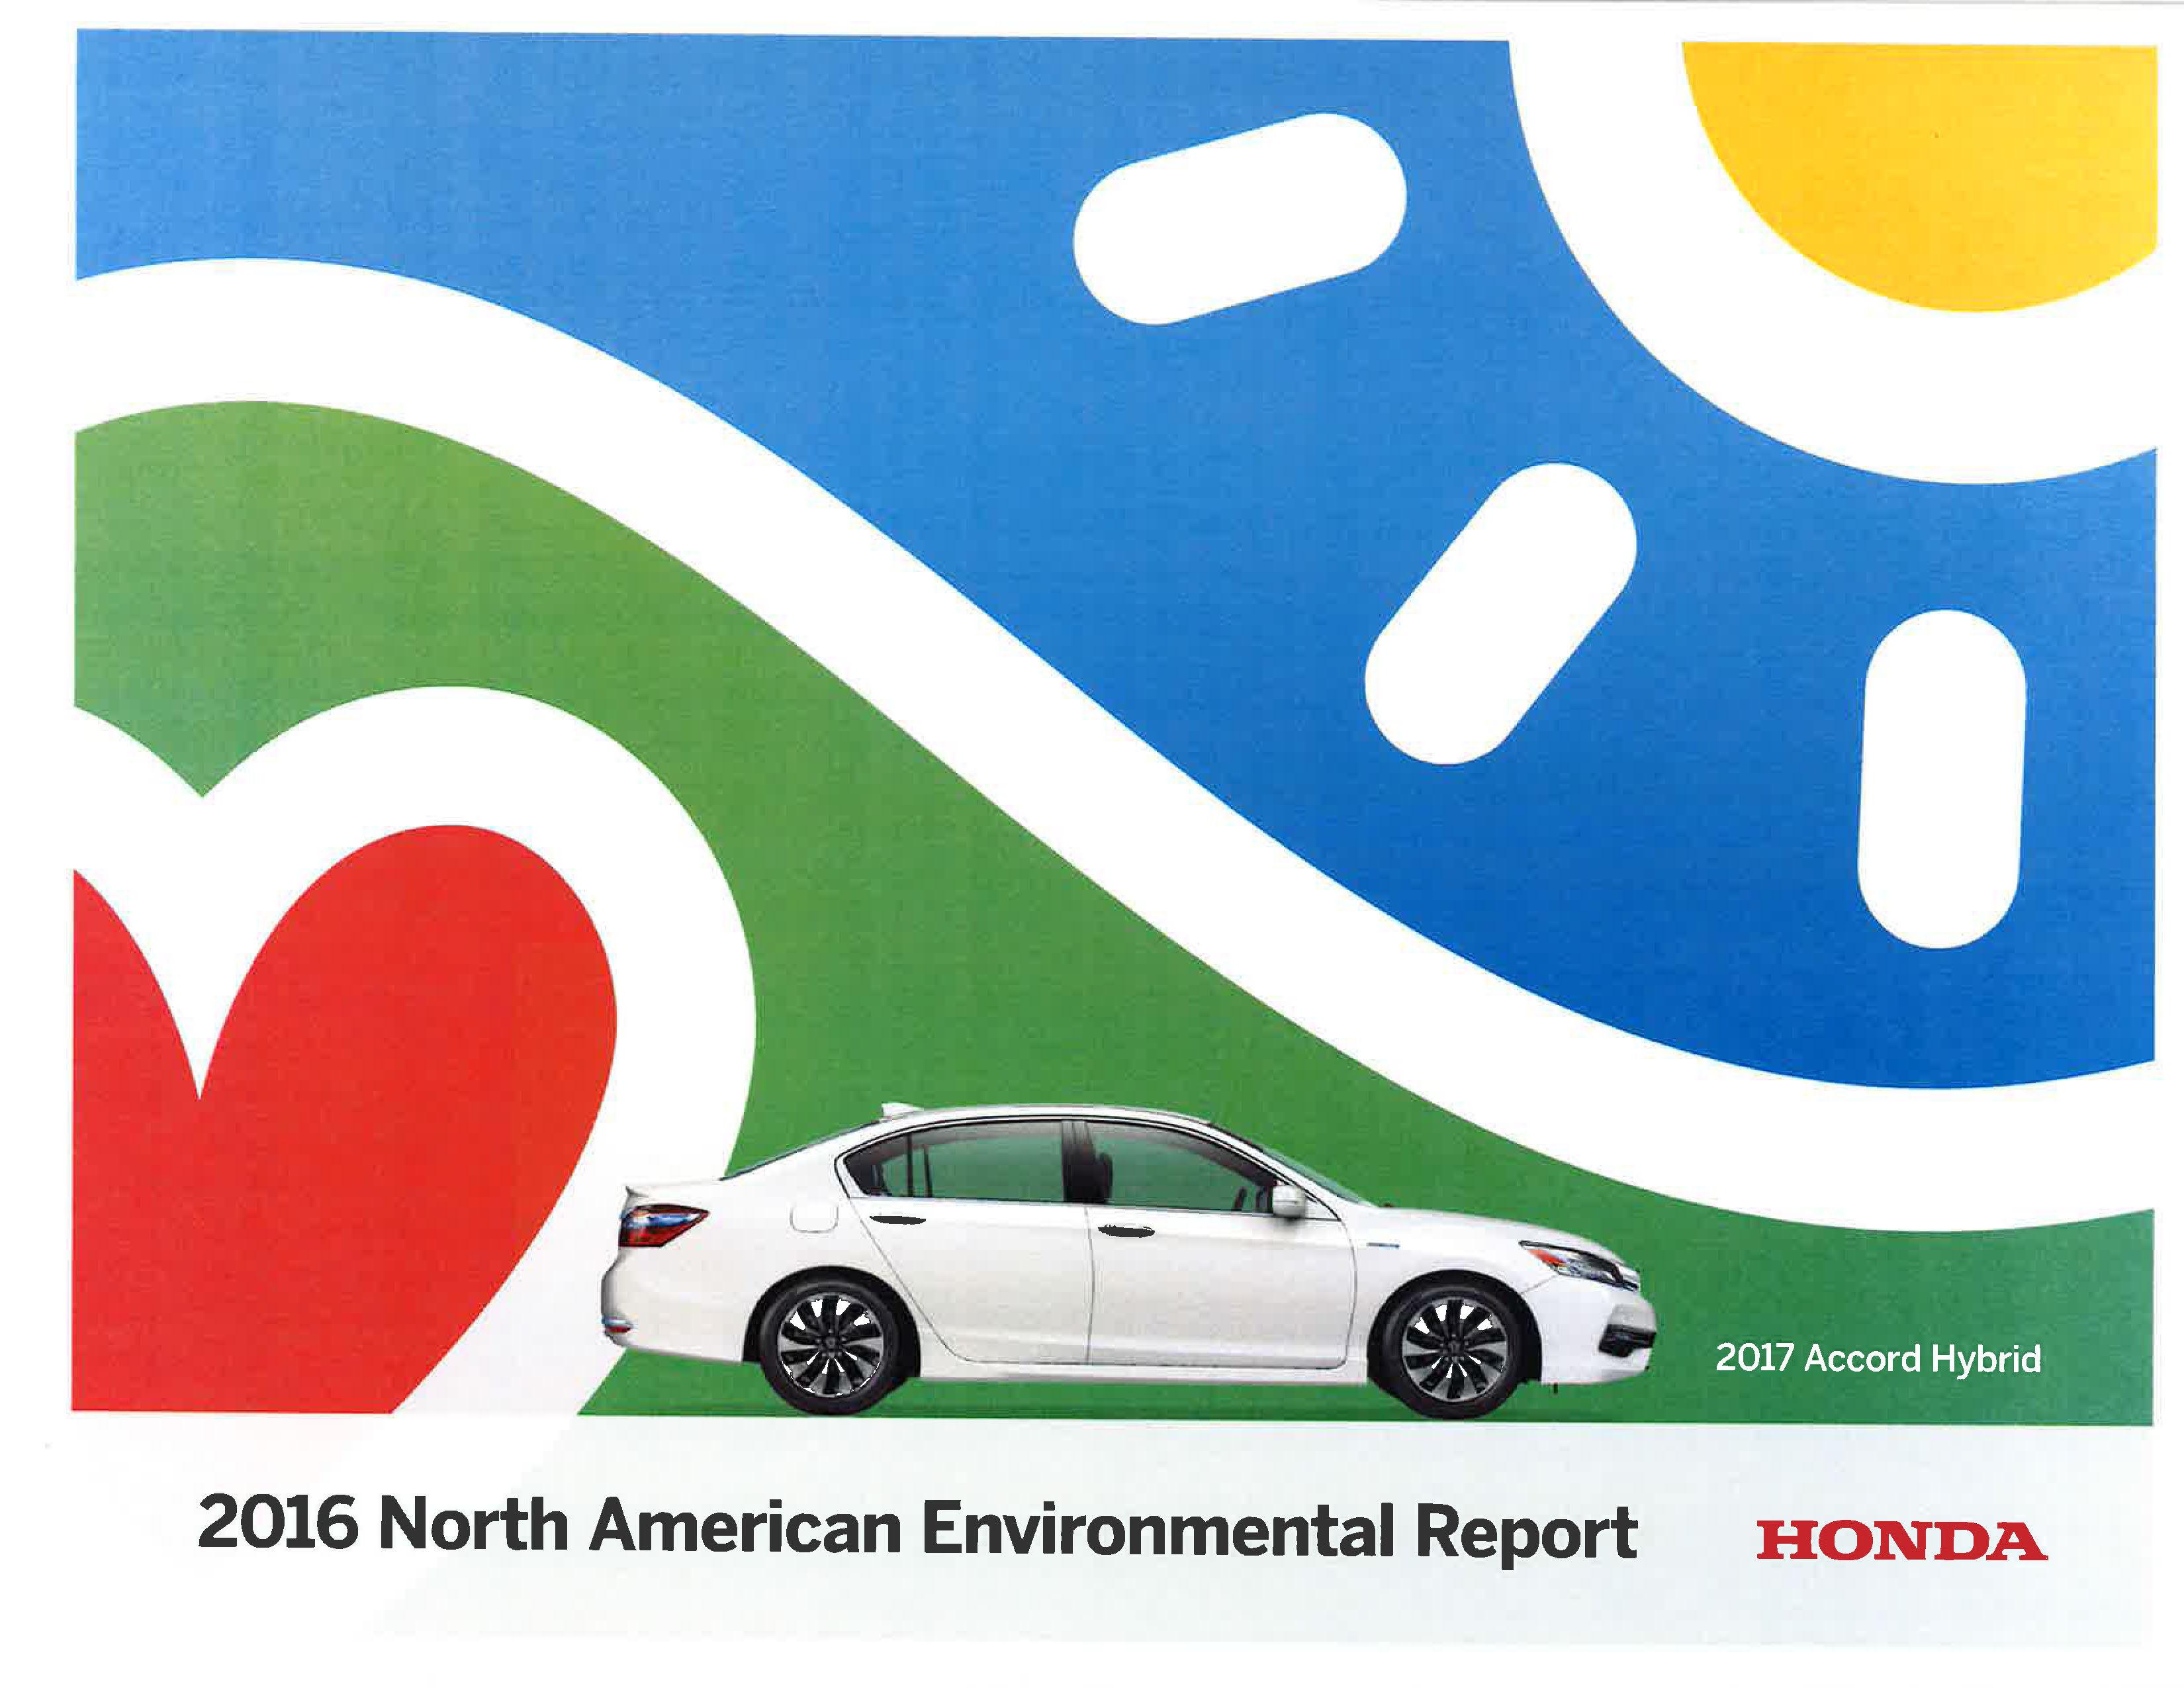 Honda North America >> Honda Reports On Its Environmental Performance And Progress In North